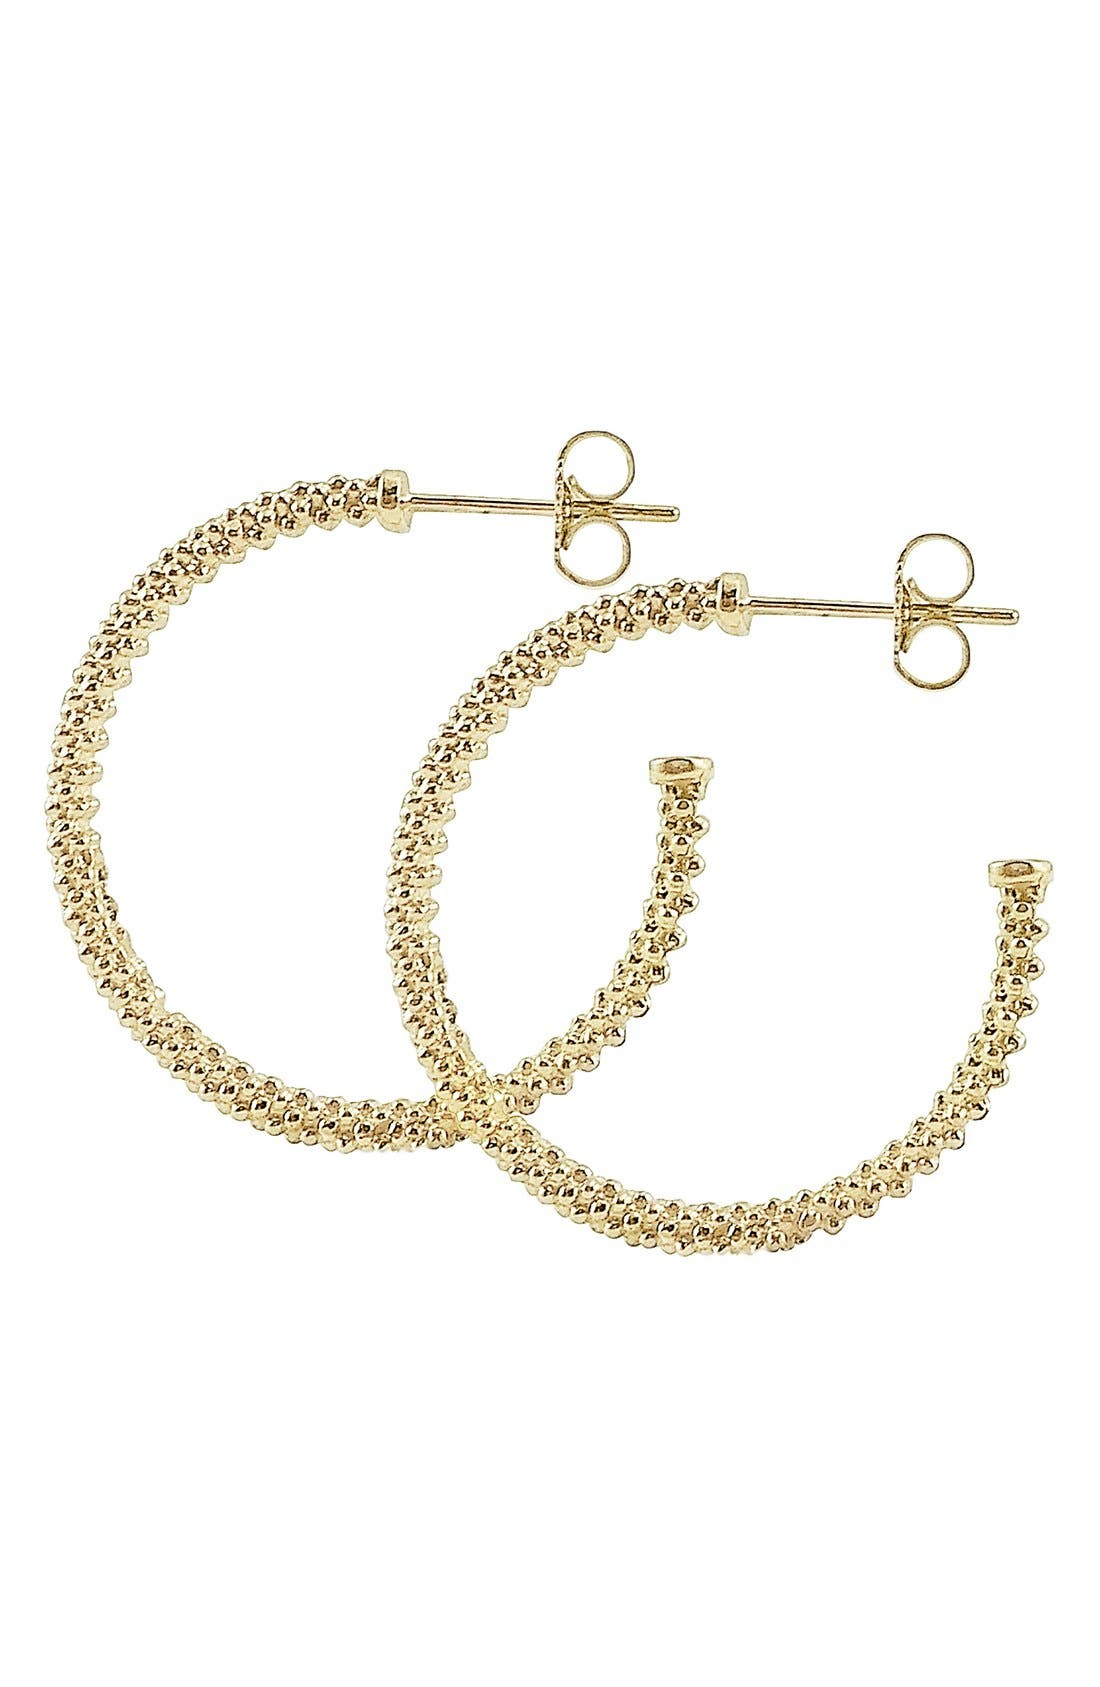 Caviar Hoop Earrings,                             Alternate thumbnail 4, color,                             GOLD